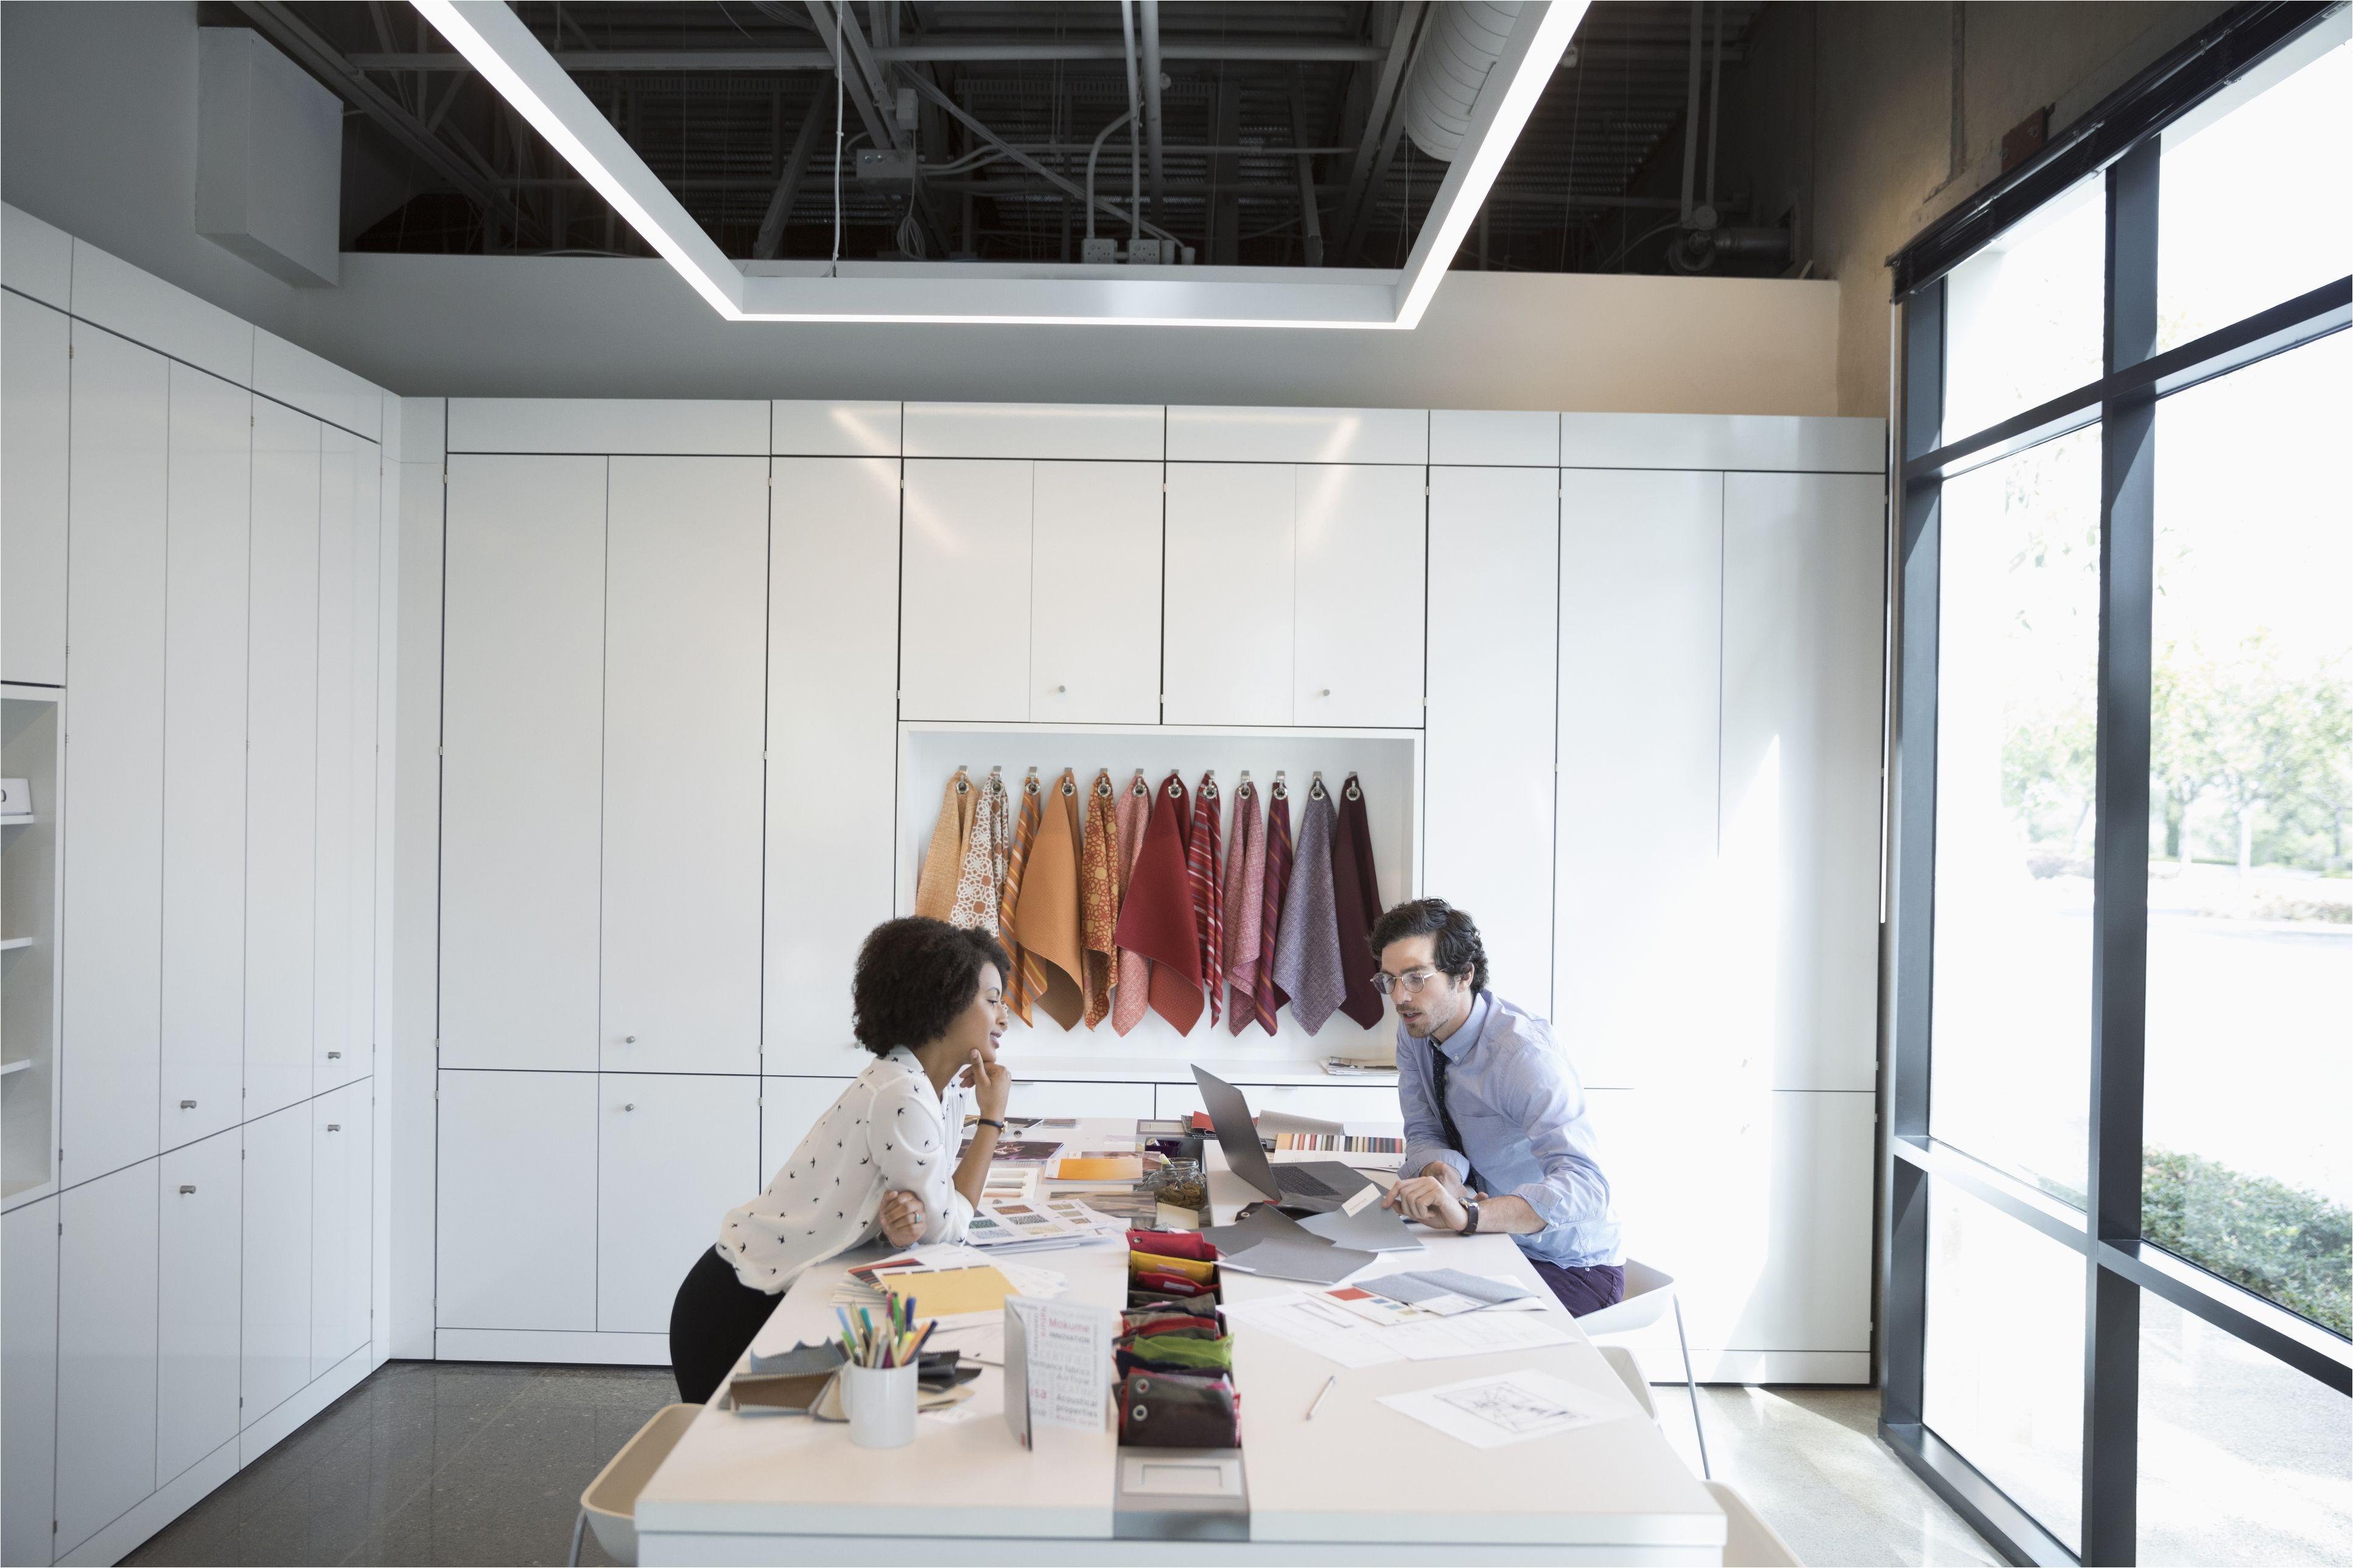 free online interior design courses with certificates uk beautiful rh bradshomefurnishings com